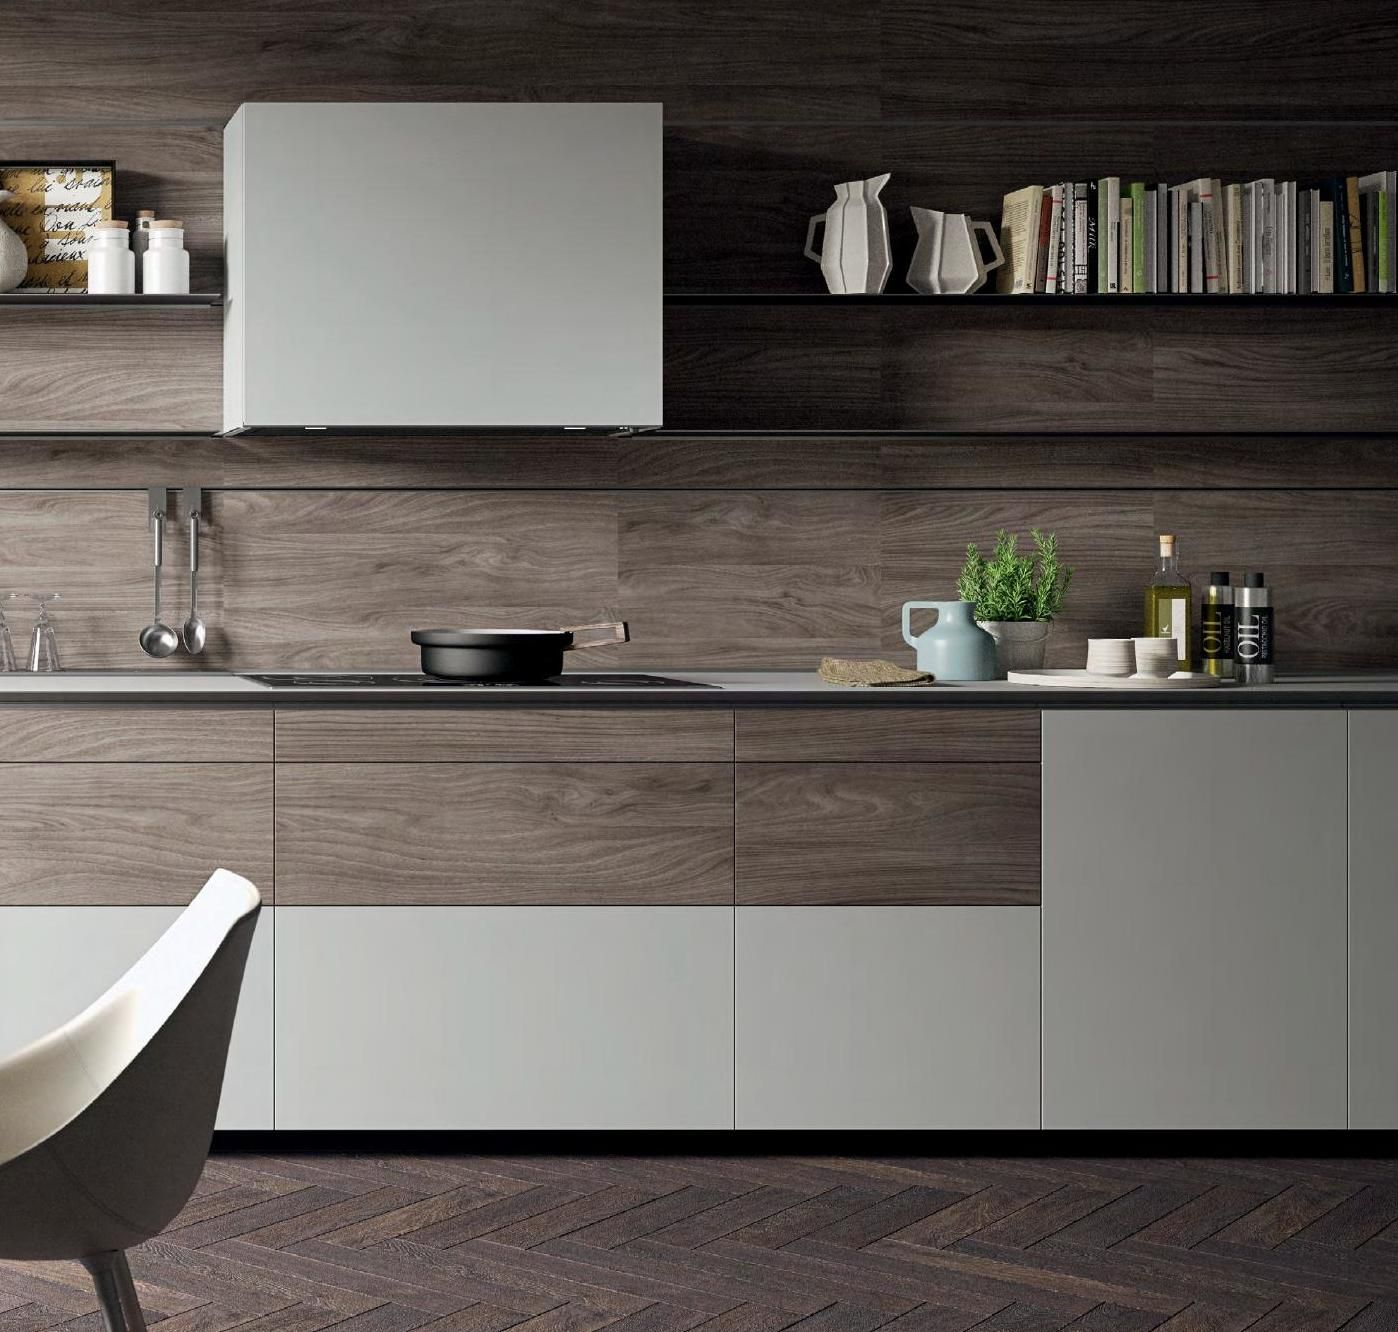 Kitchen Tiles Catalogue forma mentis kitchen catalogue | catalog, kitchens and kitchen floors